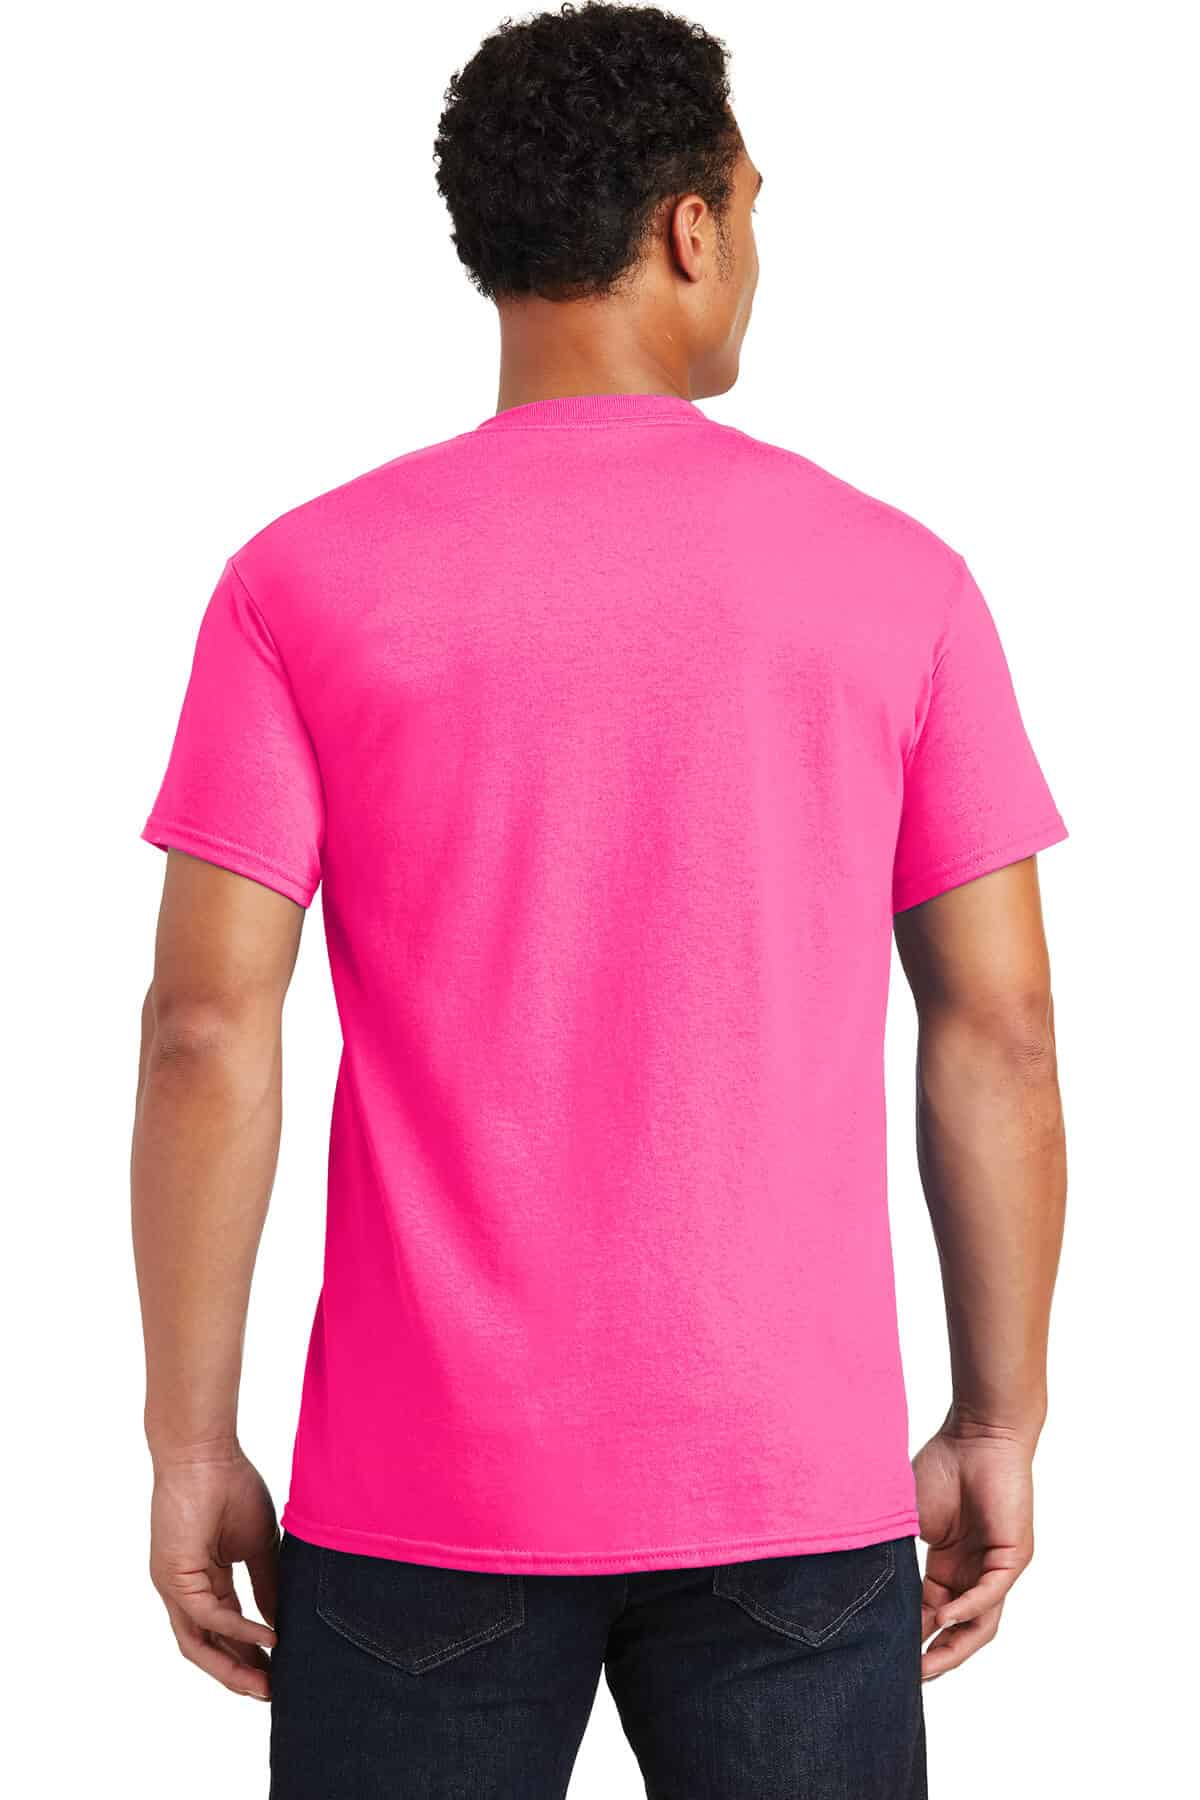 Safety Pink Teeshirt Back